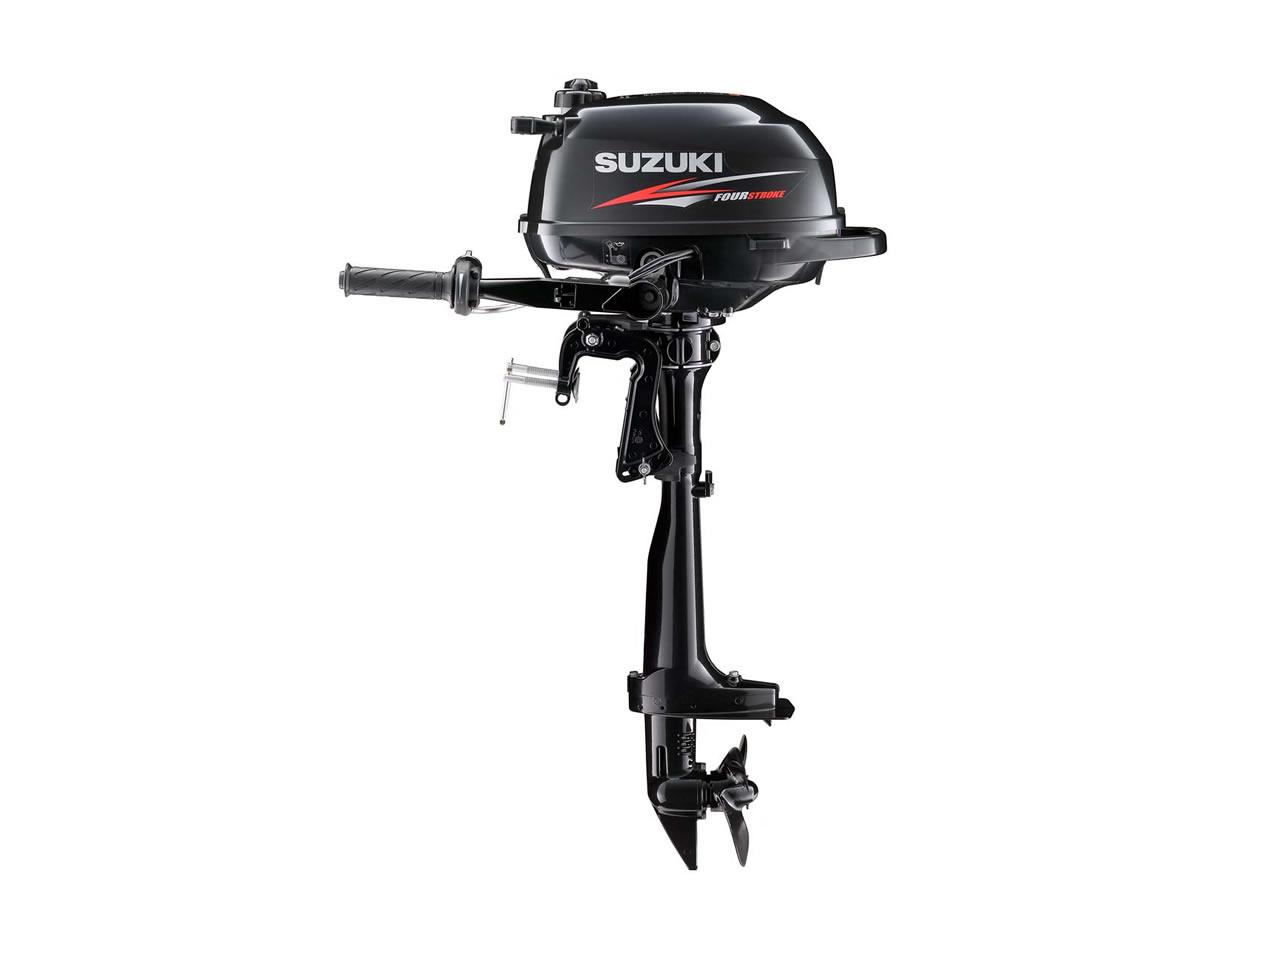 Suzuki   Outboard Weight  Four Stroke